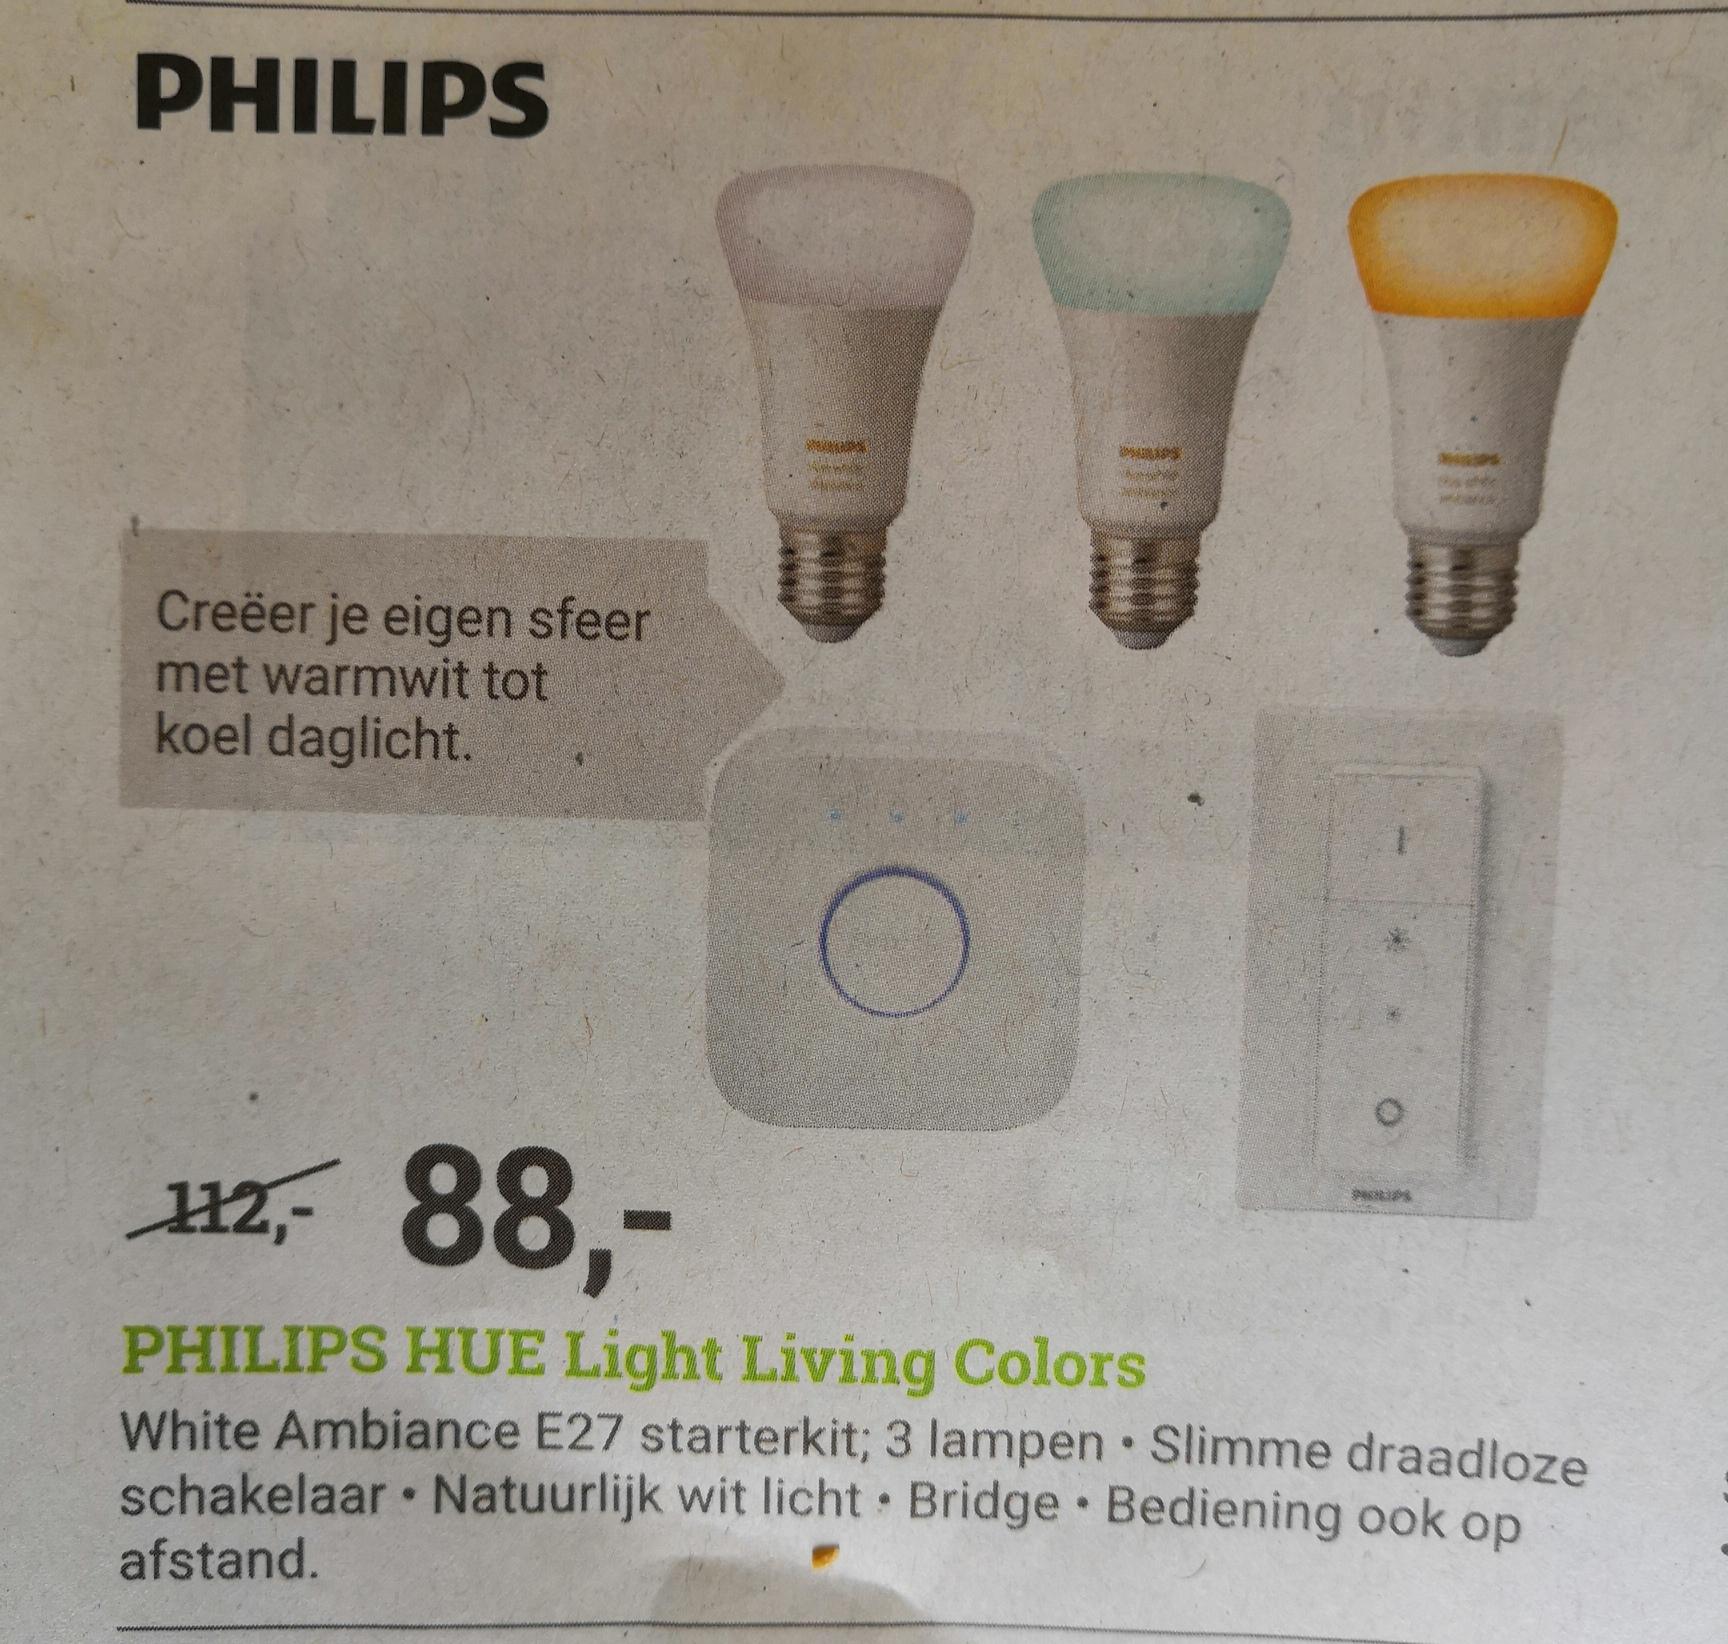 Philips Hue sfeerverlichting White Ambiance E27 Starterkit @BCC